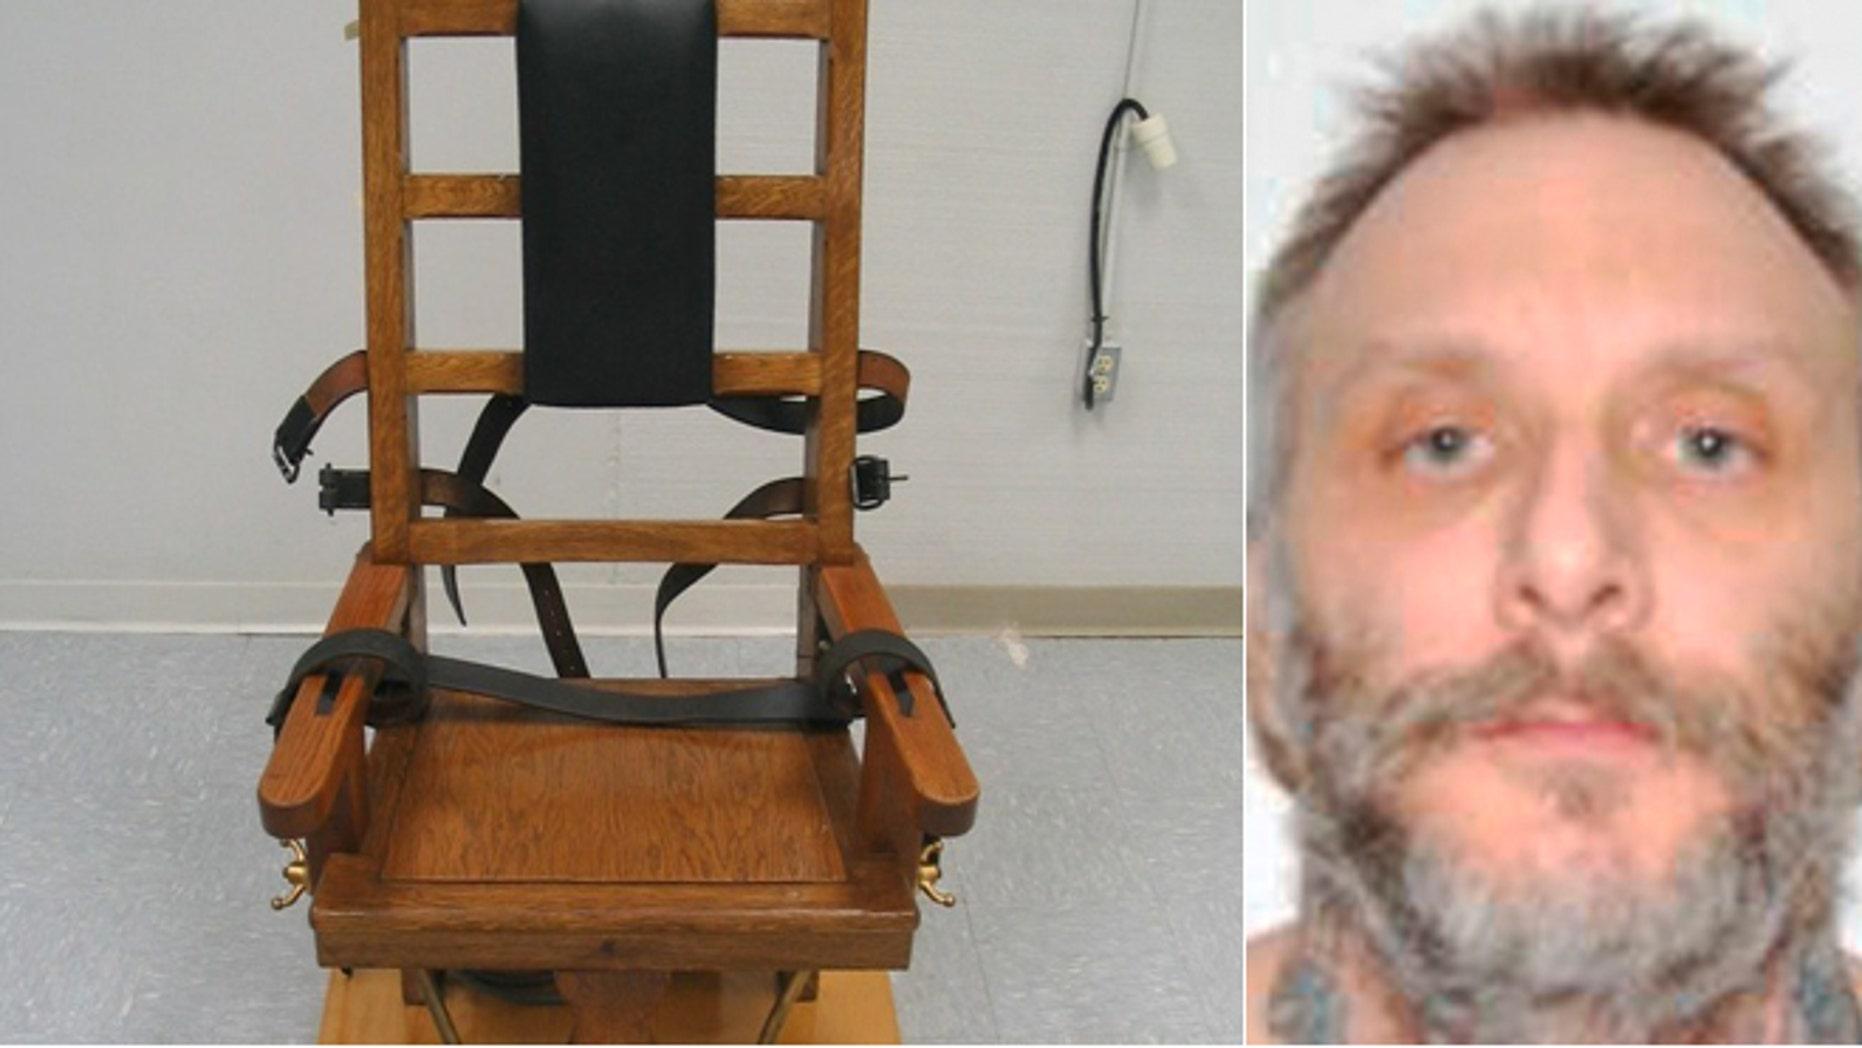 Robert Gleason at the Red Onion prison in Pound, Va. Gleason is scheduled to die at 9 p.m. Wednesday at Greensville Correctional Center in Jarratt.